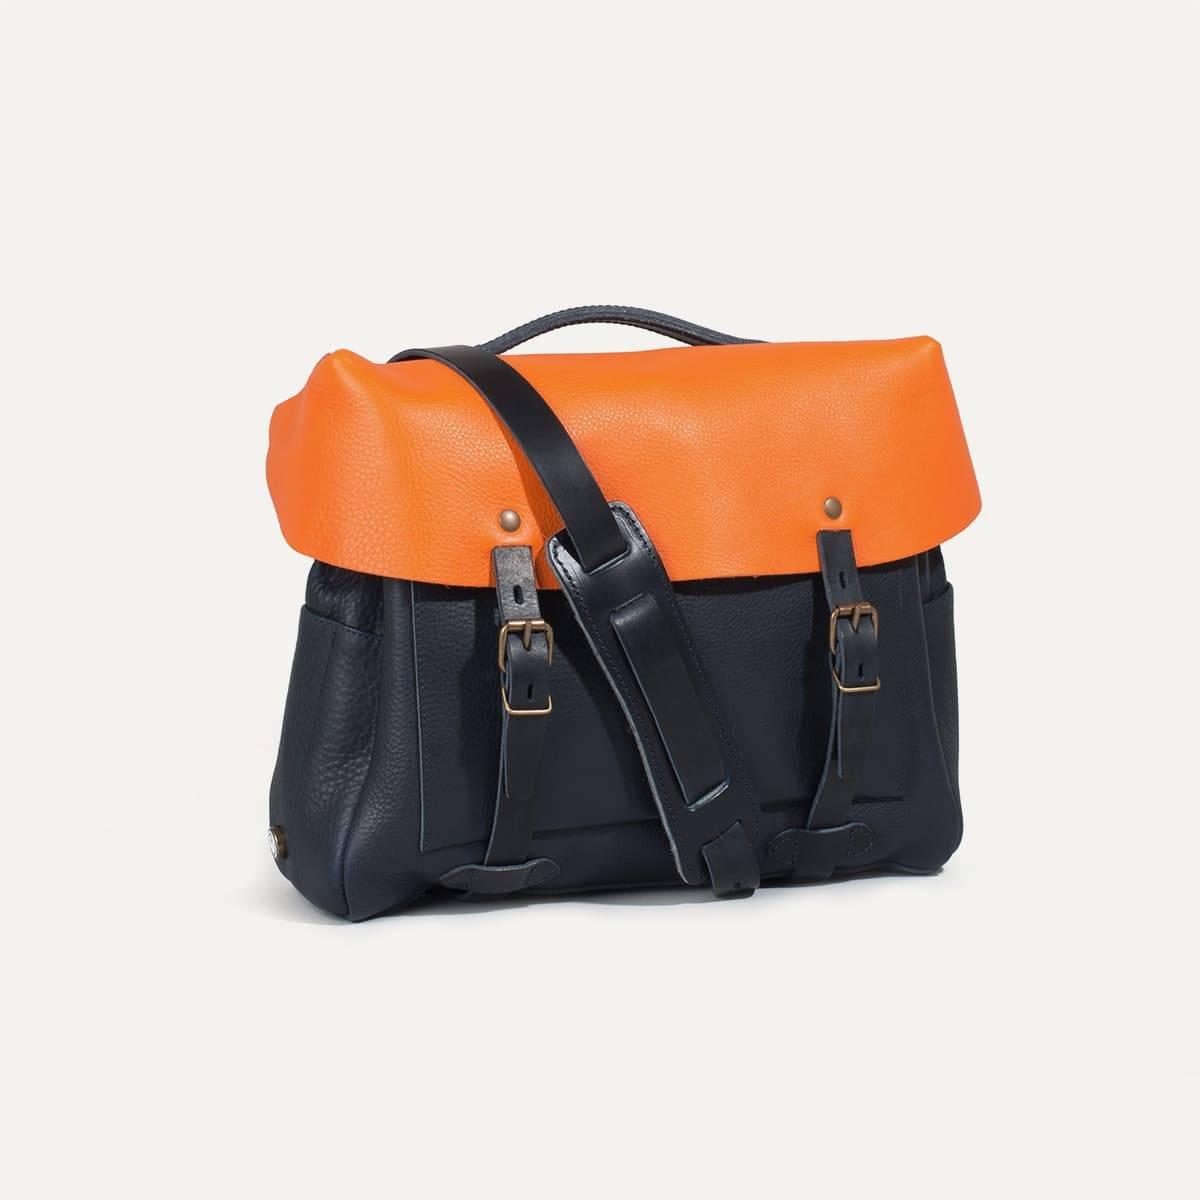 Bleu de Chauffe x Blitz Eclair bag - Navy/Orange (image n°4)